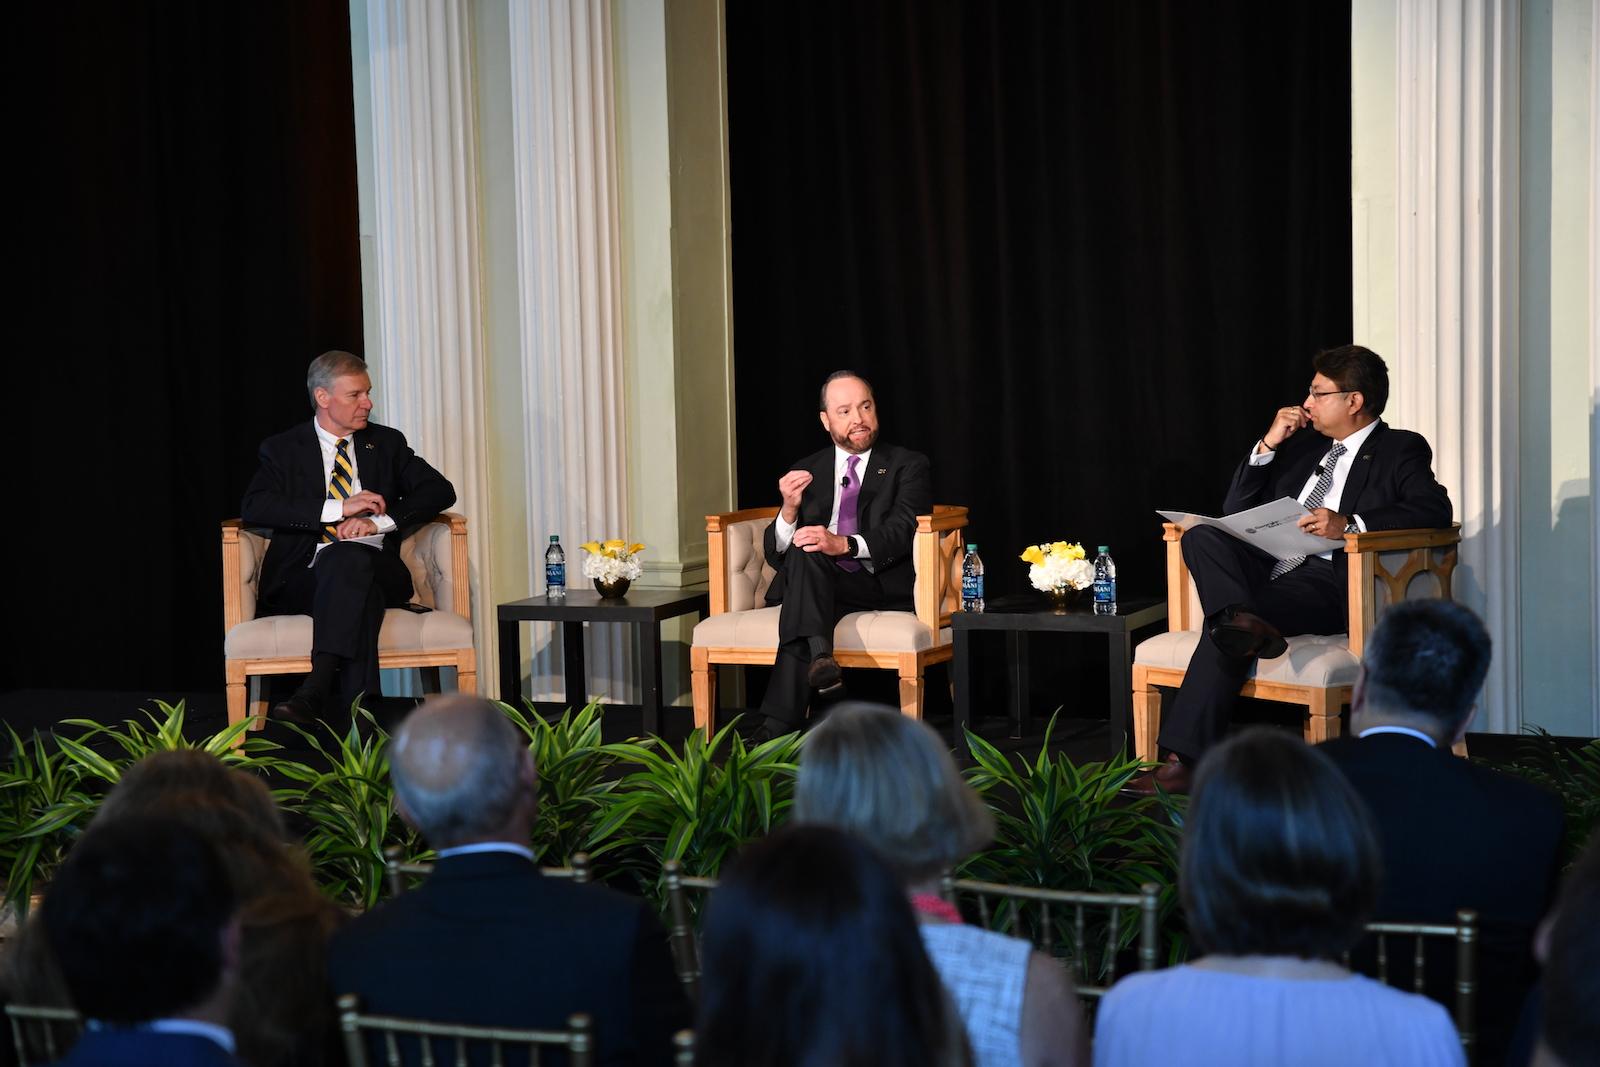 Forum Addresses Tech's Role in Economic Development